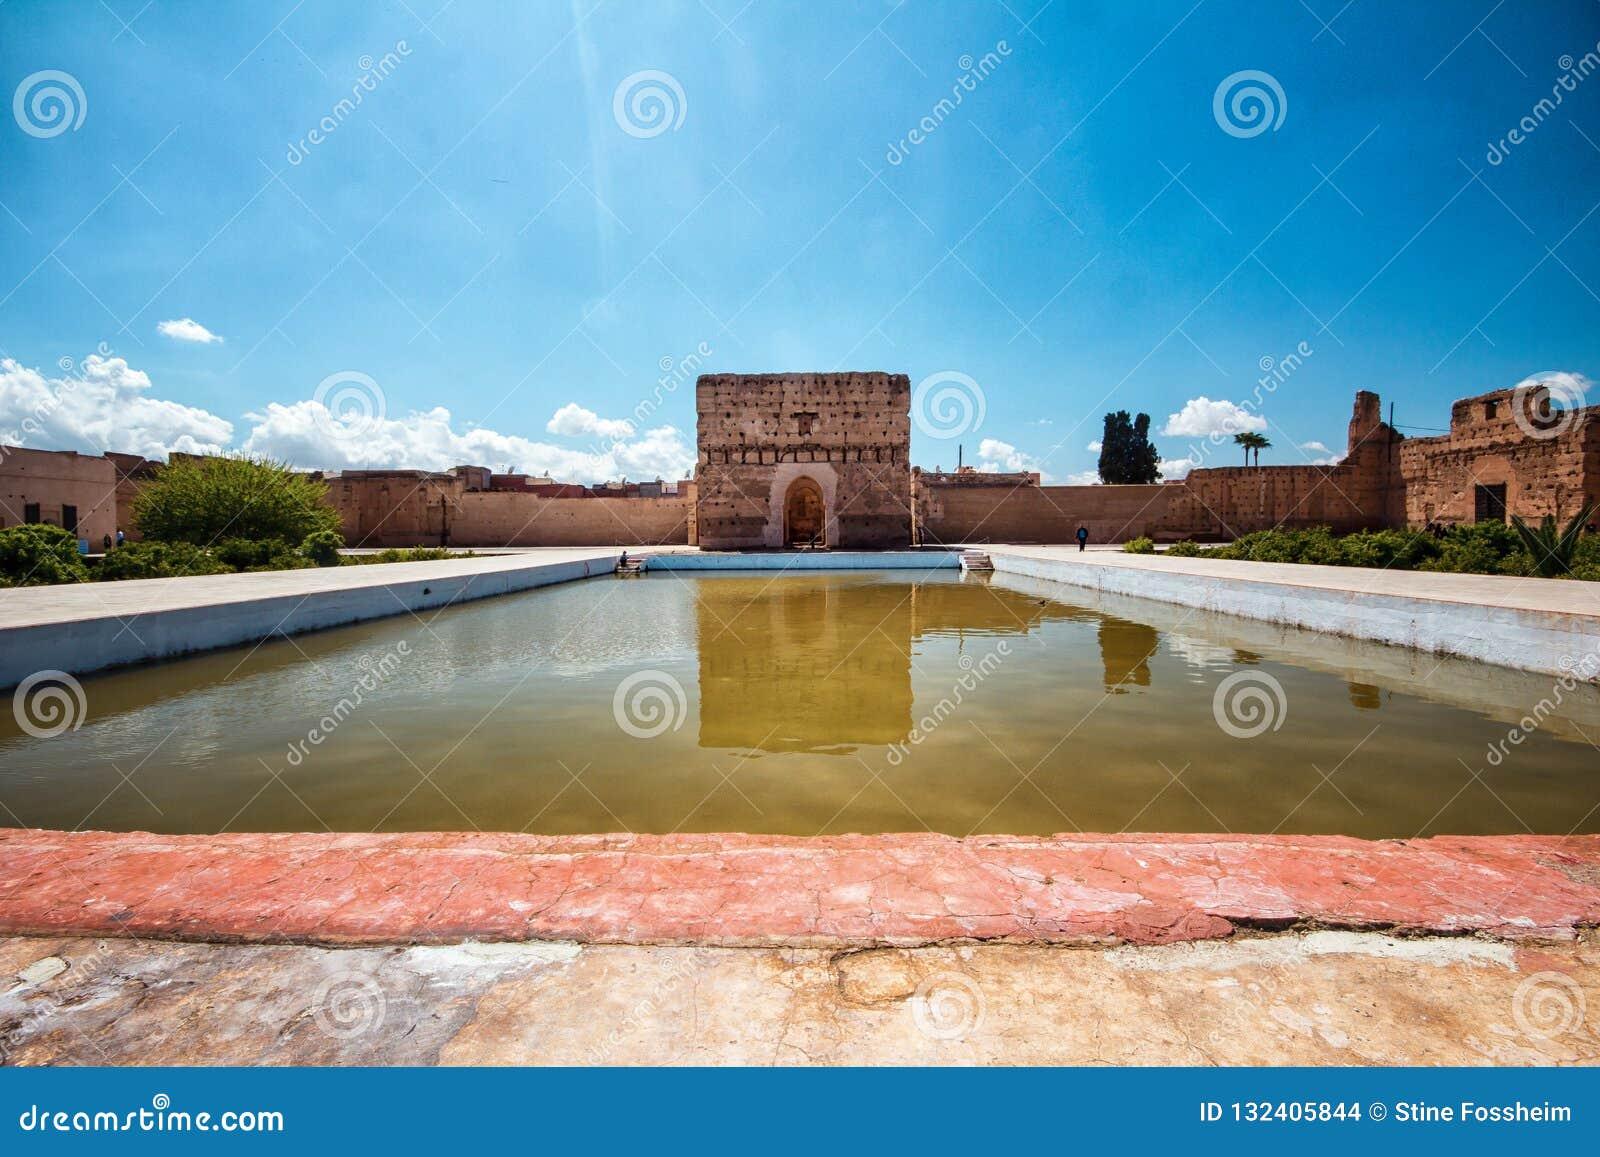 El巴迪宫殿,马拉喀什,Marocco